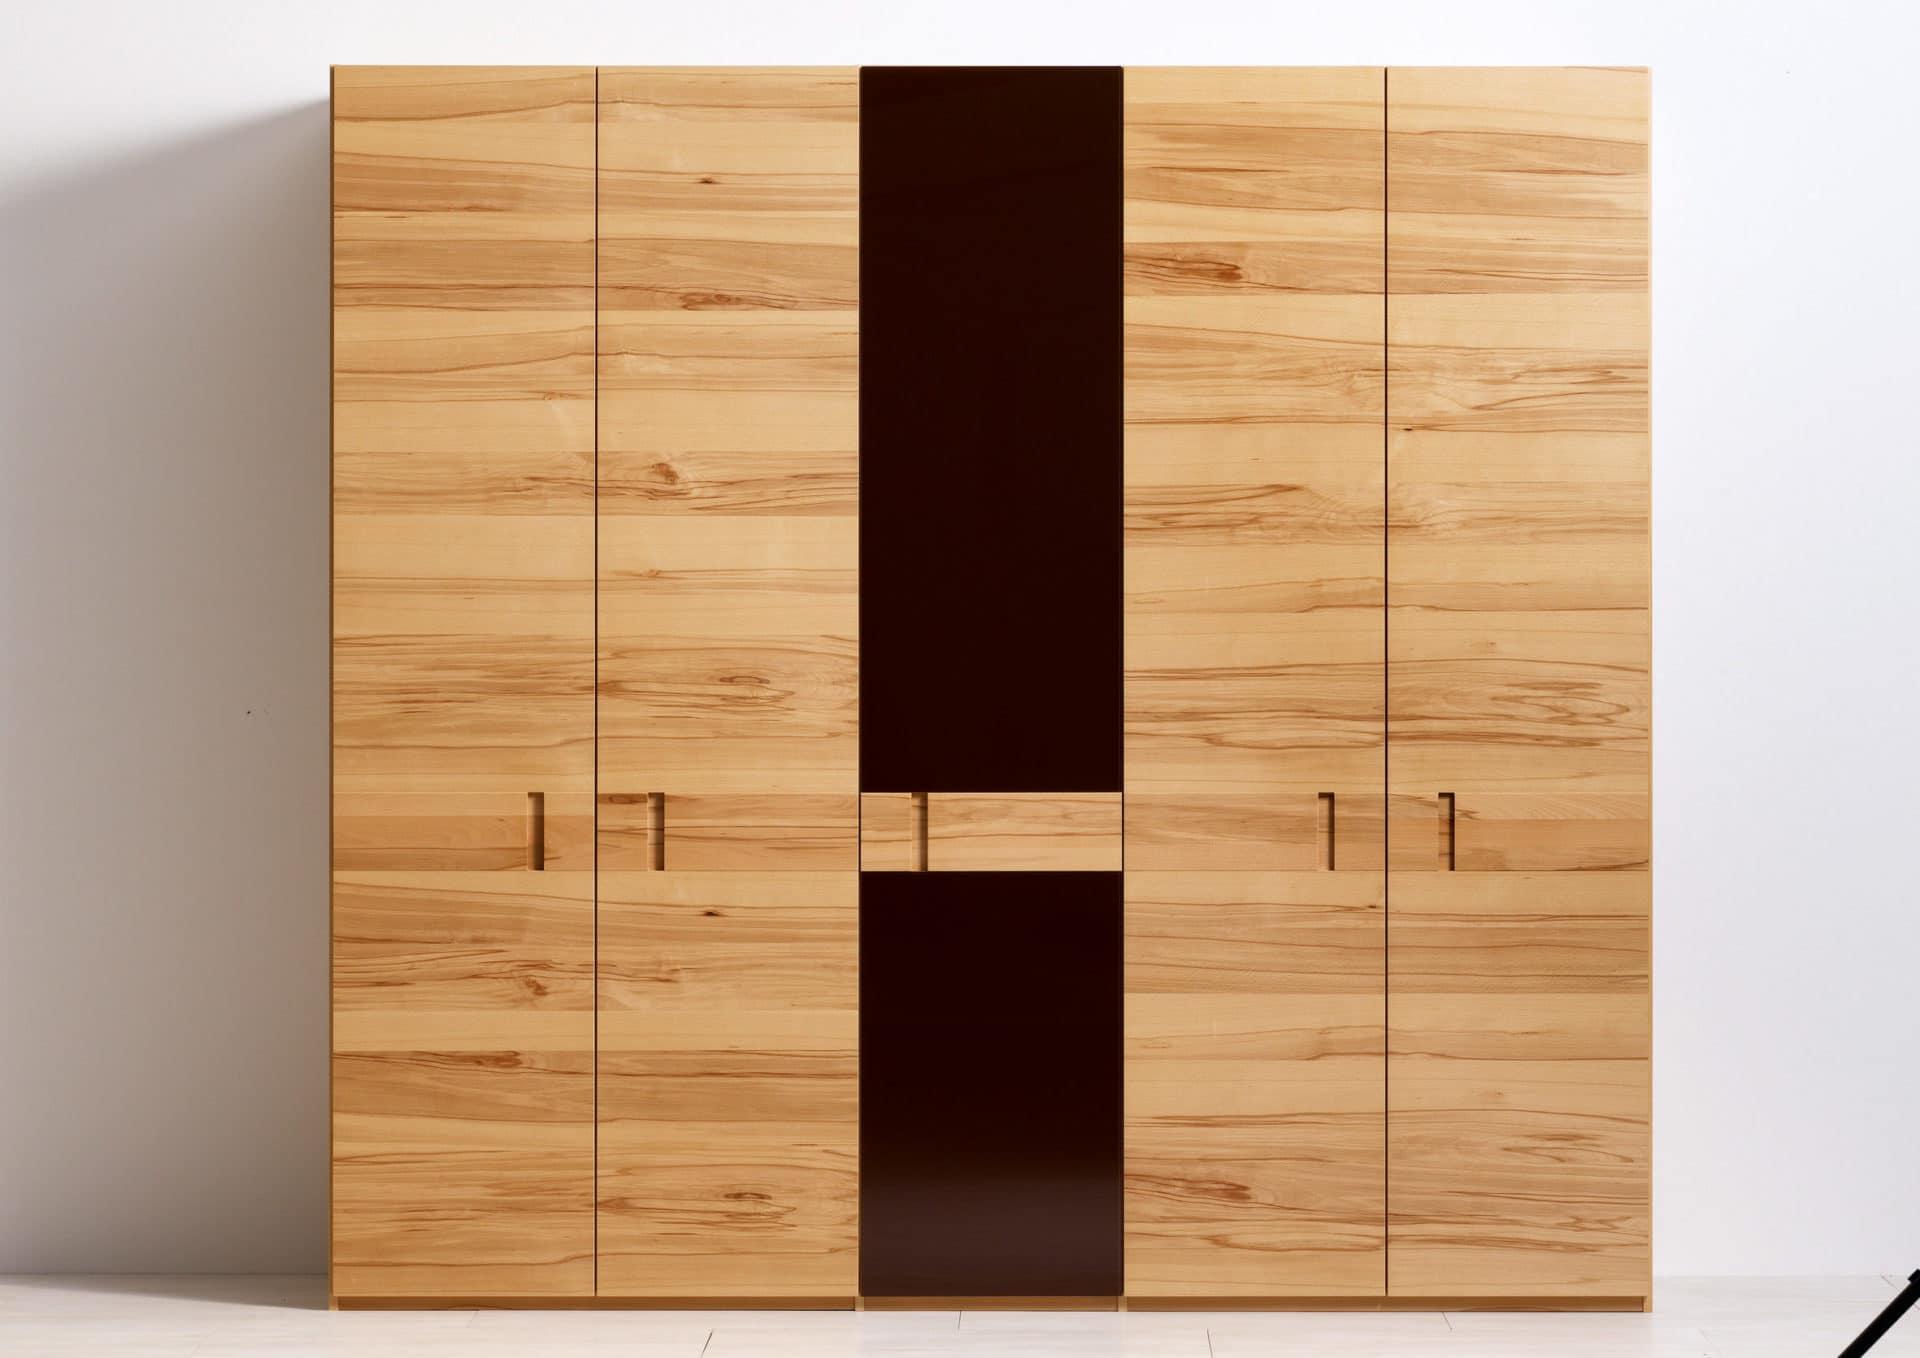 schrank rio mit glas in kernbuche ko control. Black Bedroom Furniture Sets. Home Design Ideas